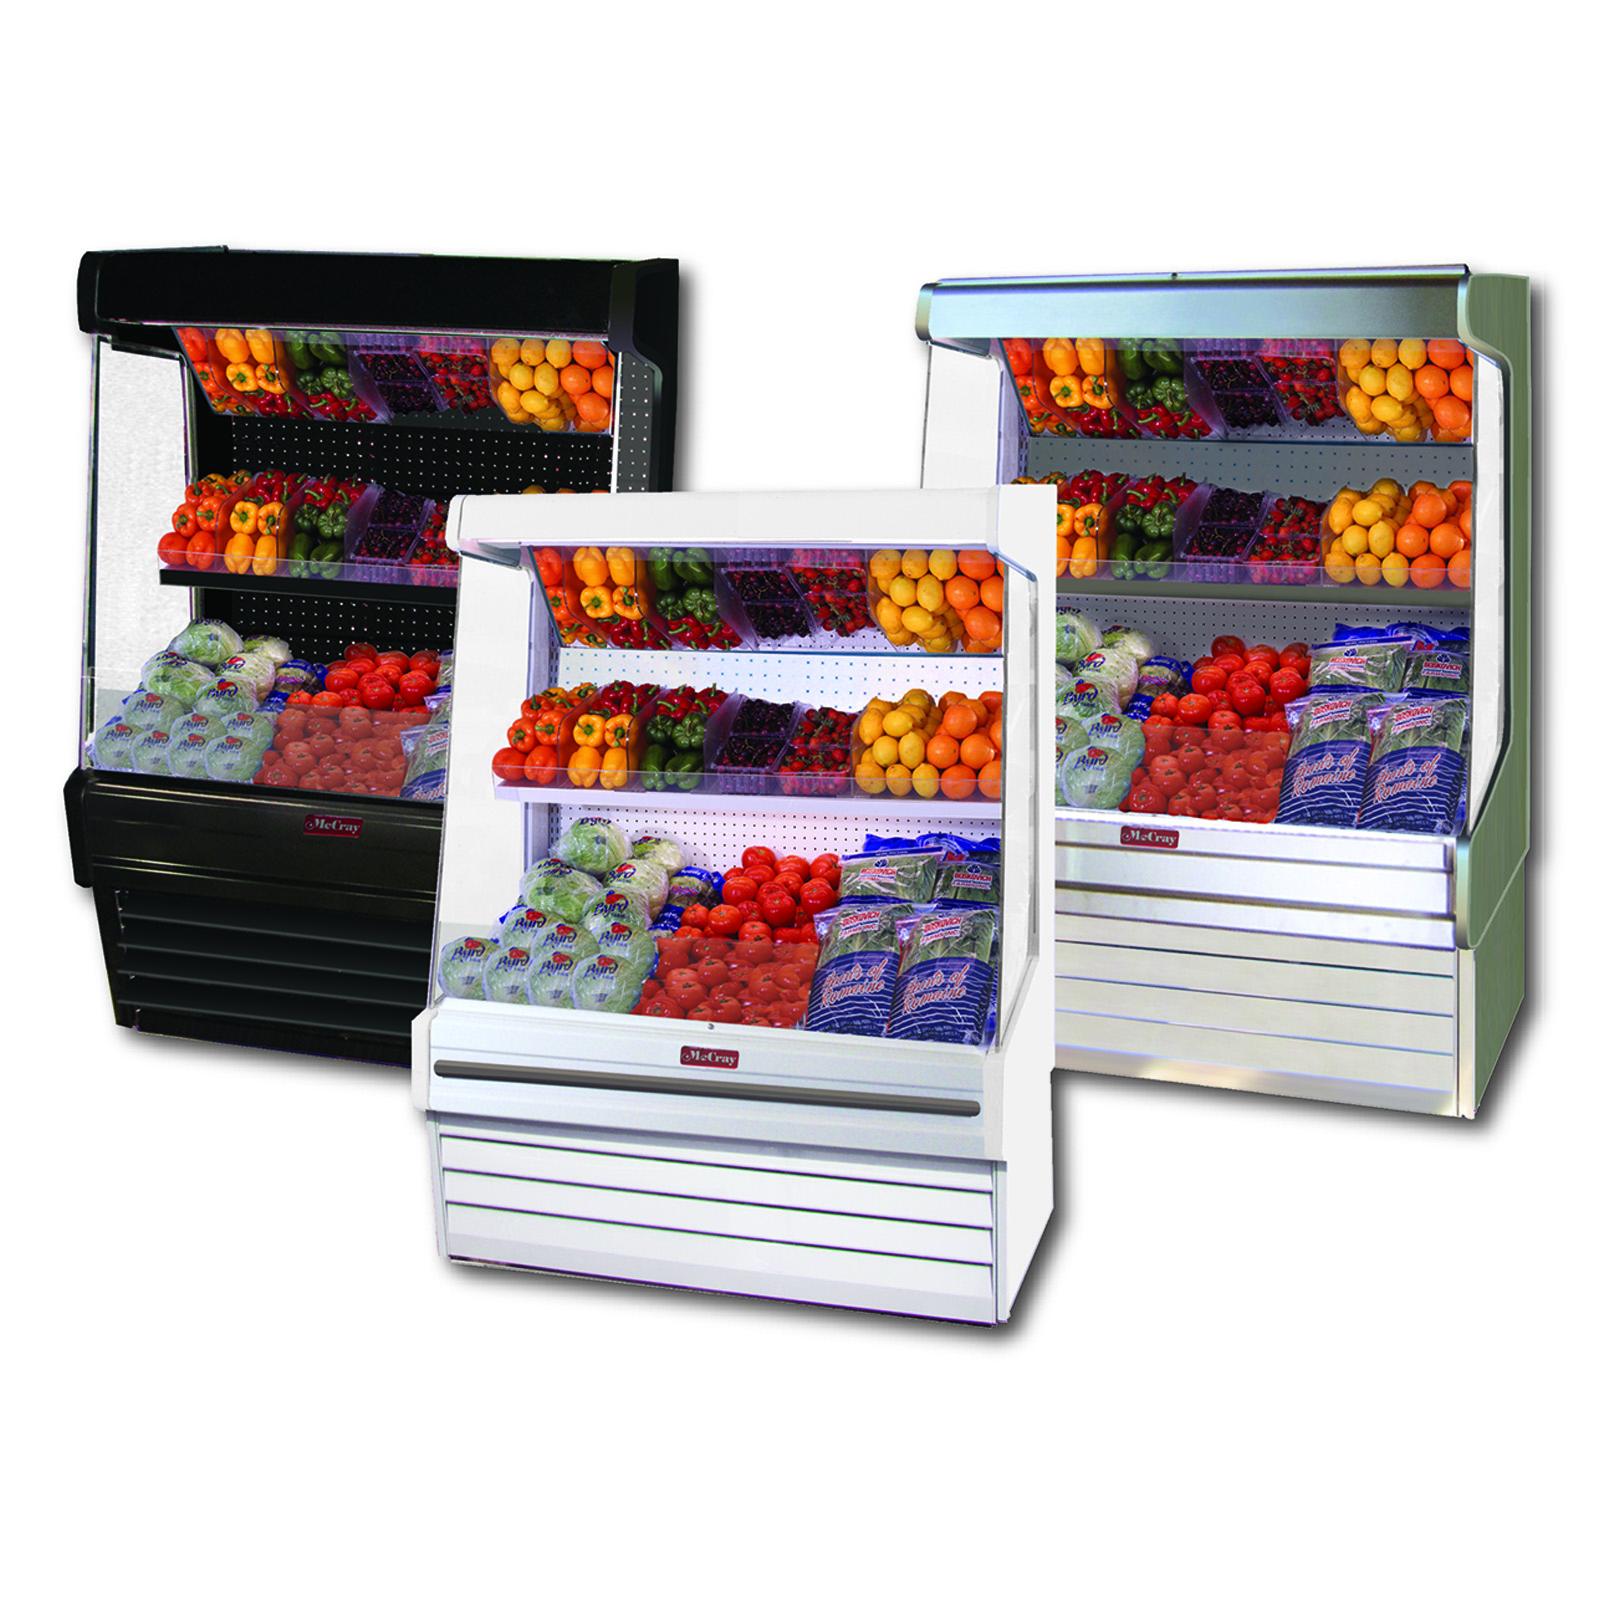 Howard-McCray R-OP30E-5-B-LED display case, produce